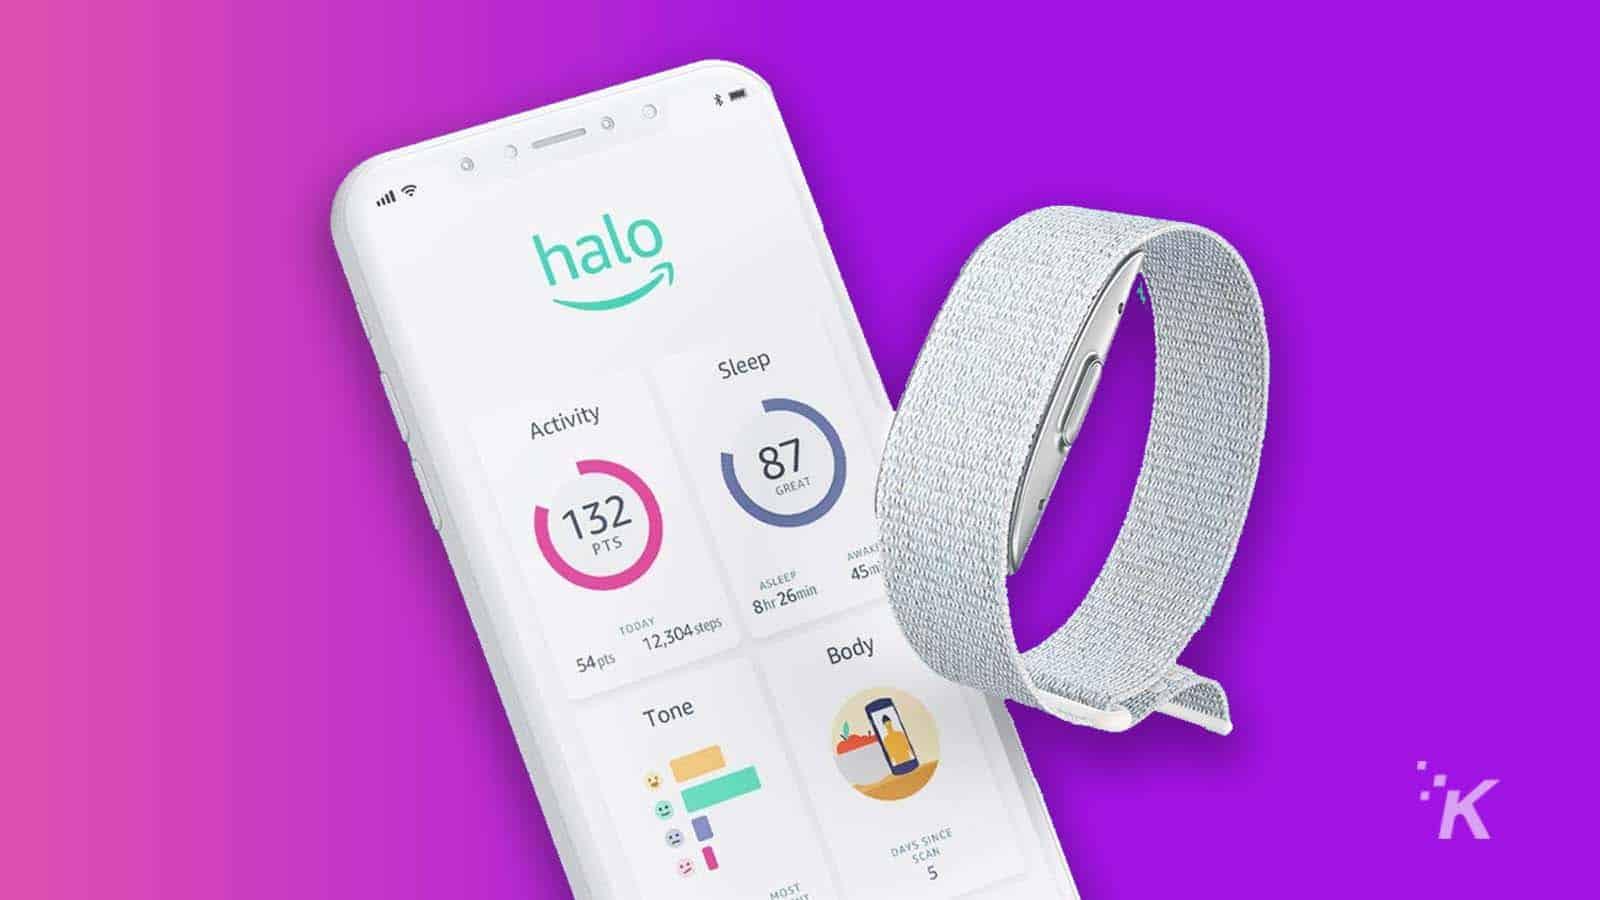 amazon halo fitness device